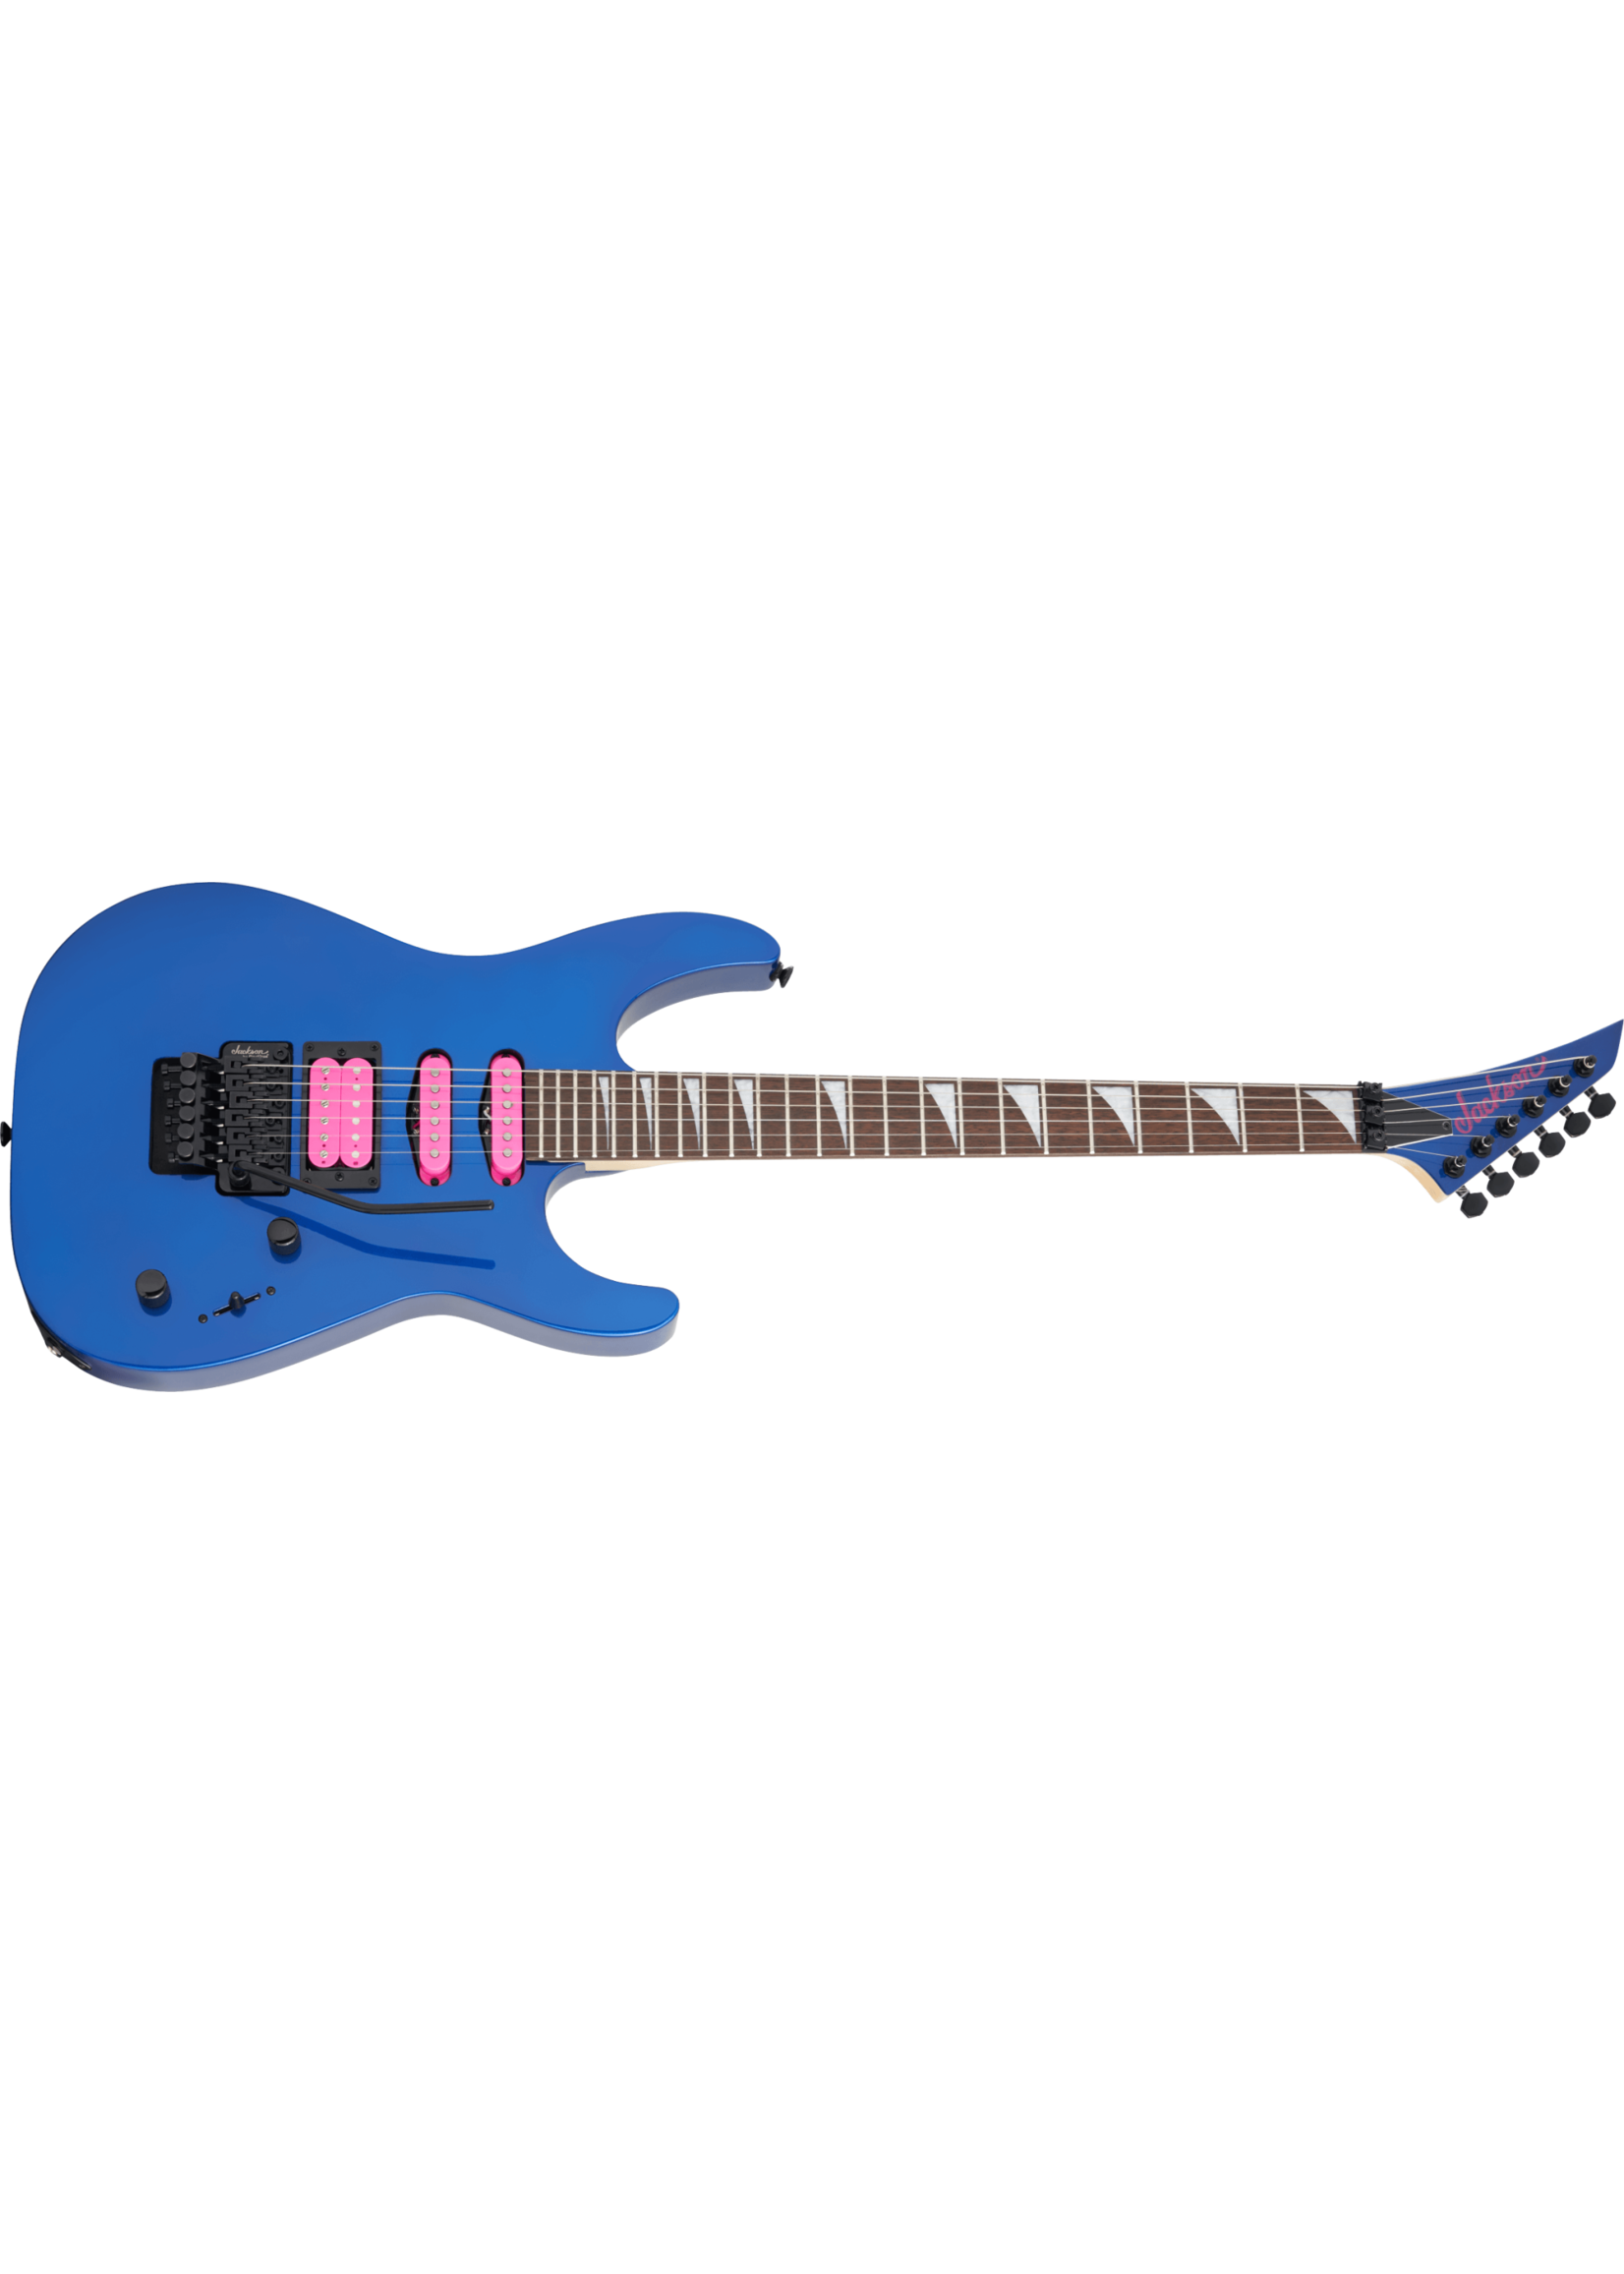 Jackson Jackson X Series Dinky DK3XR HSS Cobalt Blue